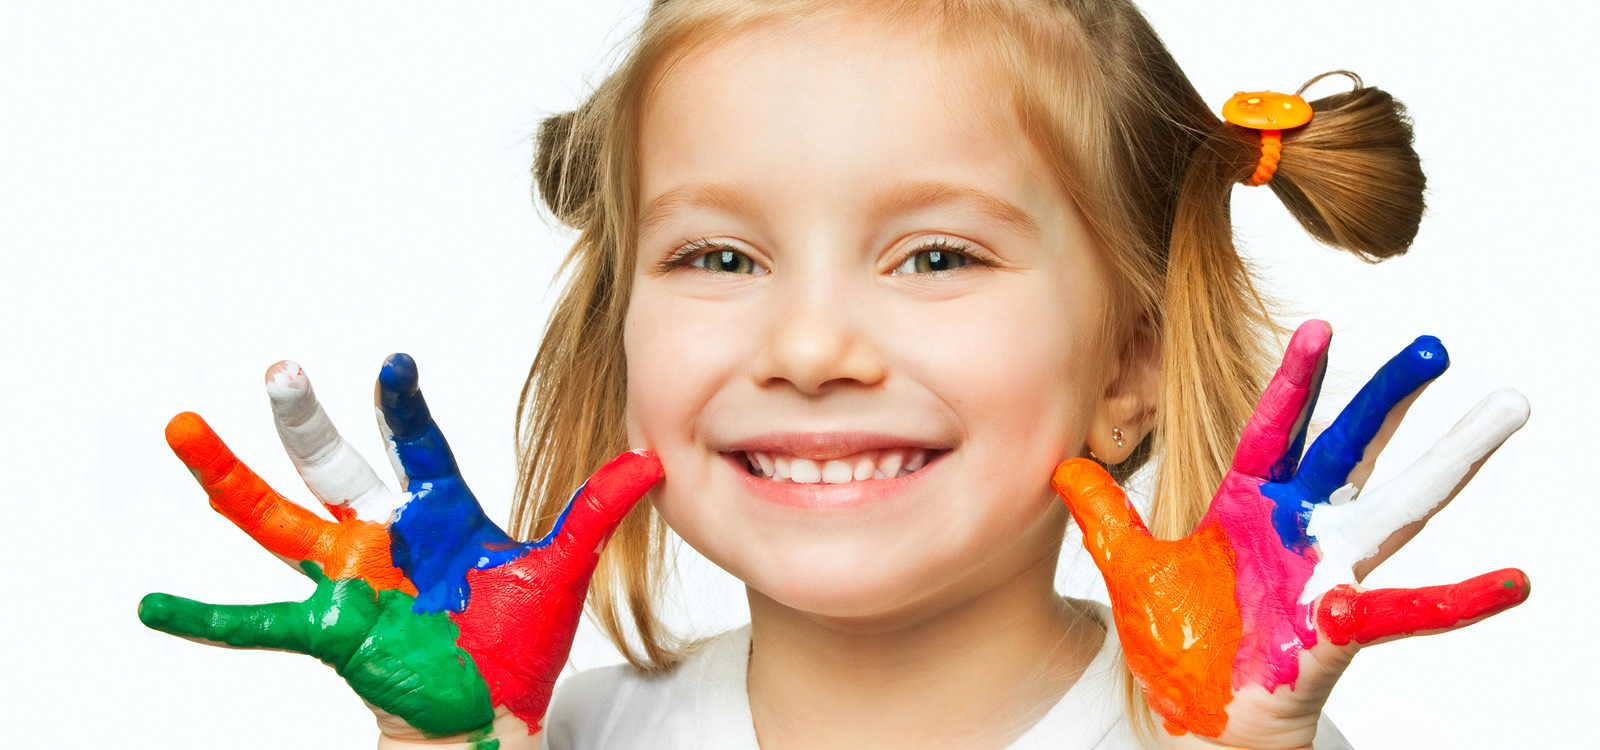 Cute preschooler with finger paint on hands